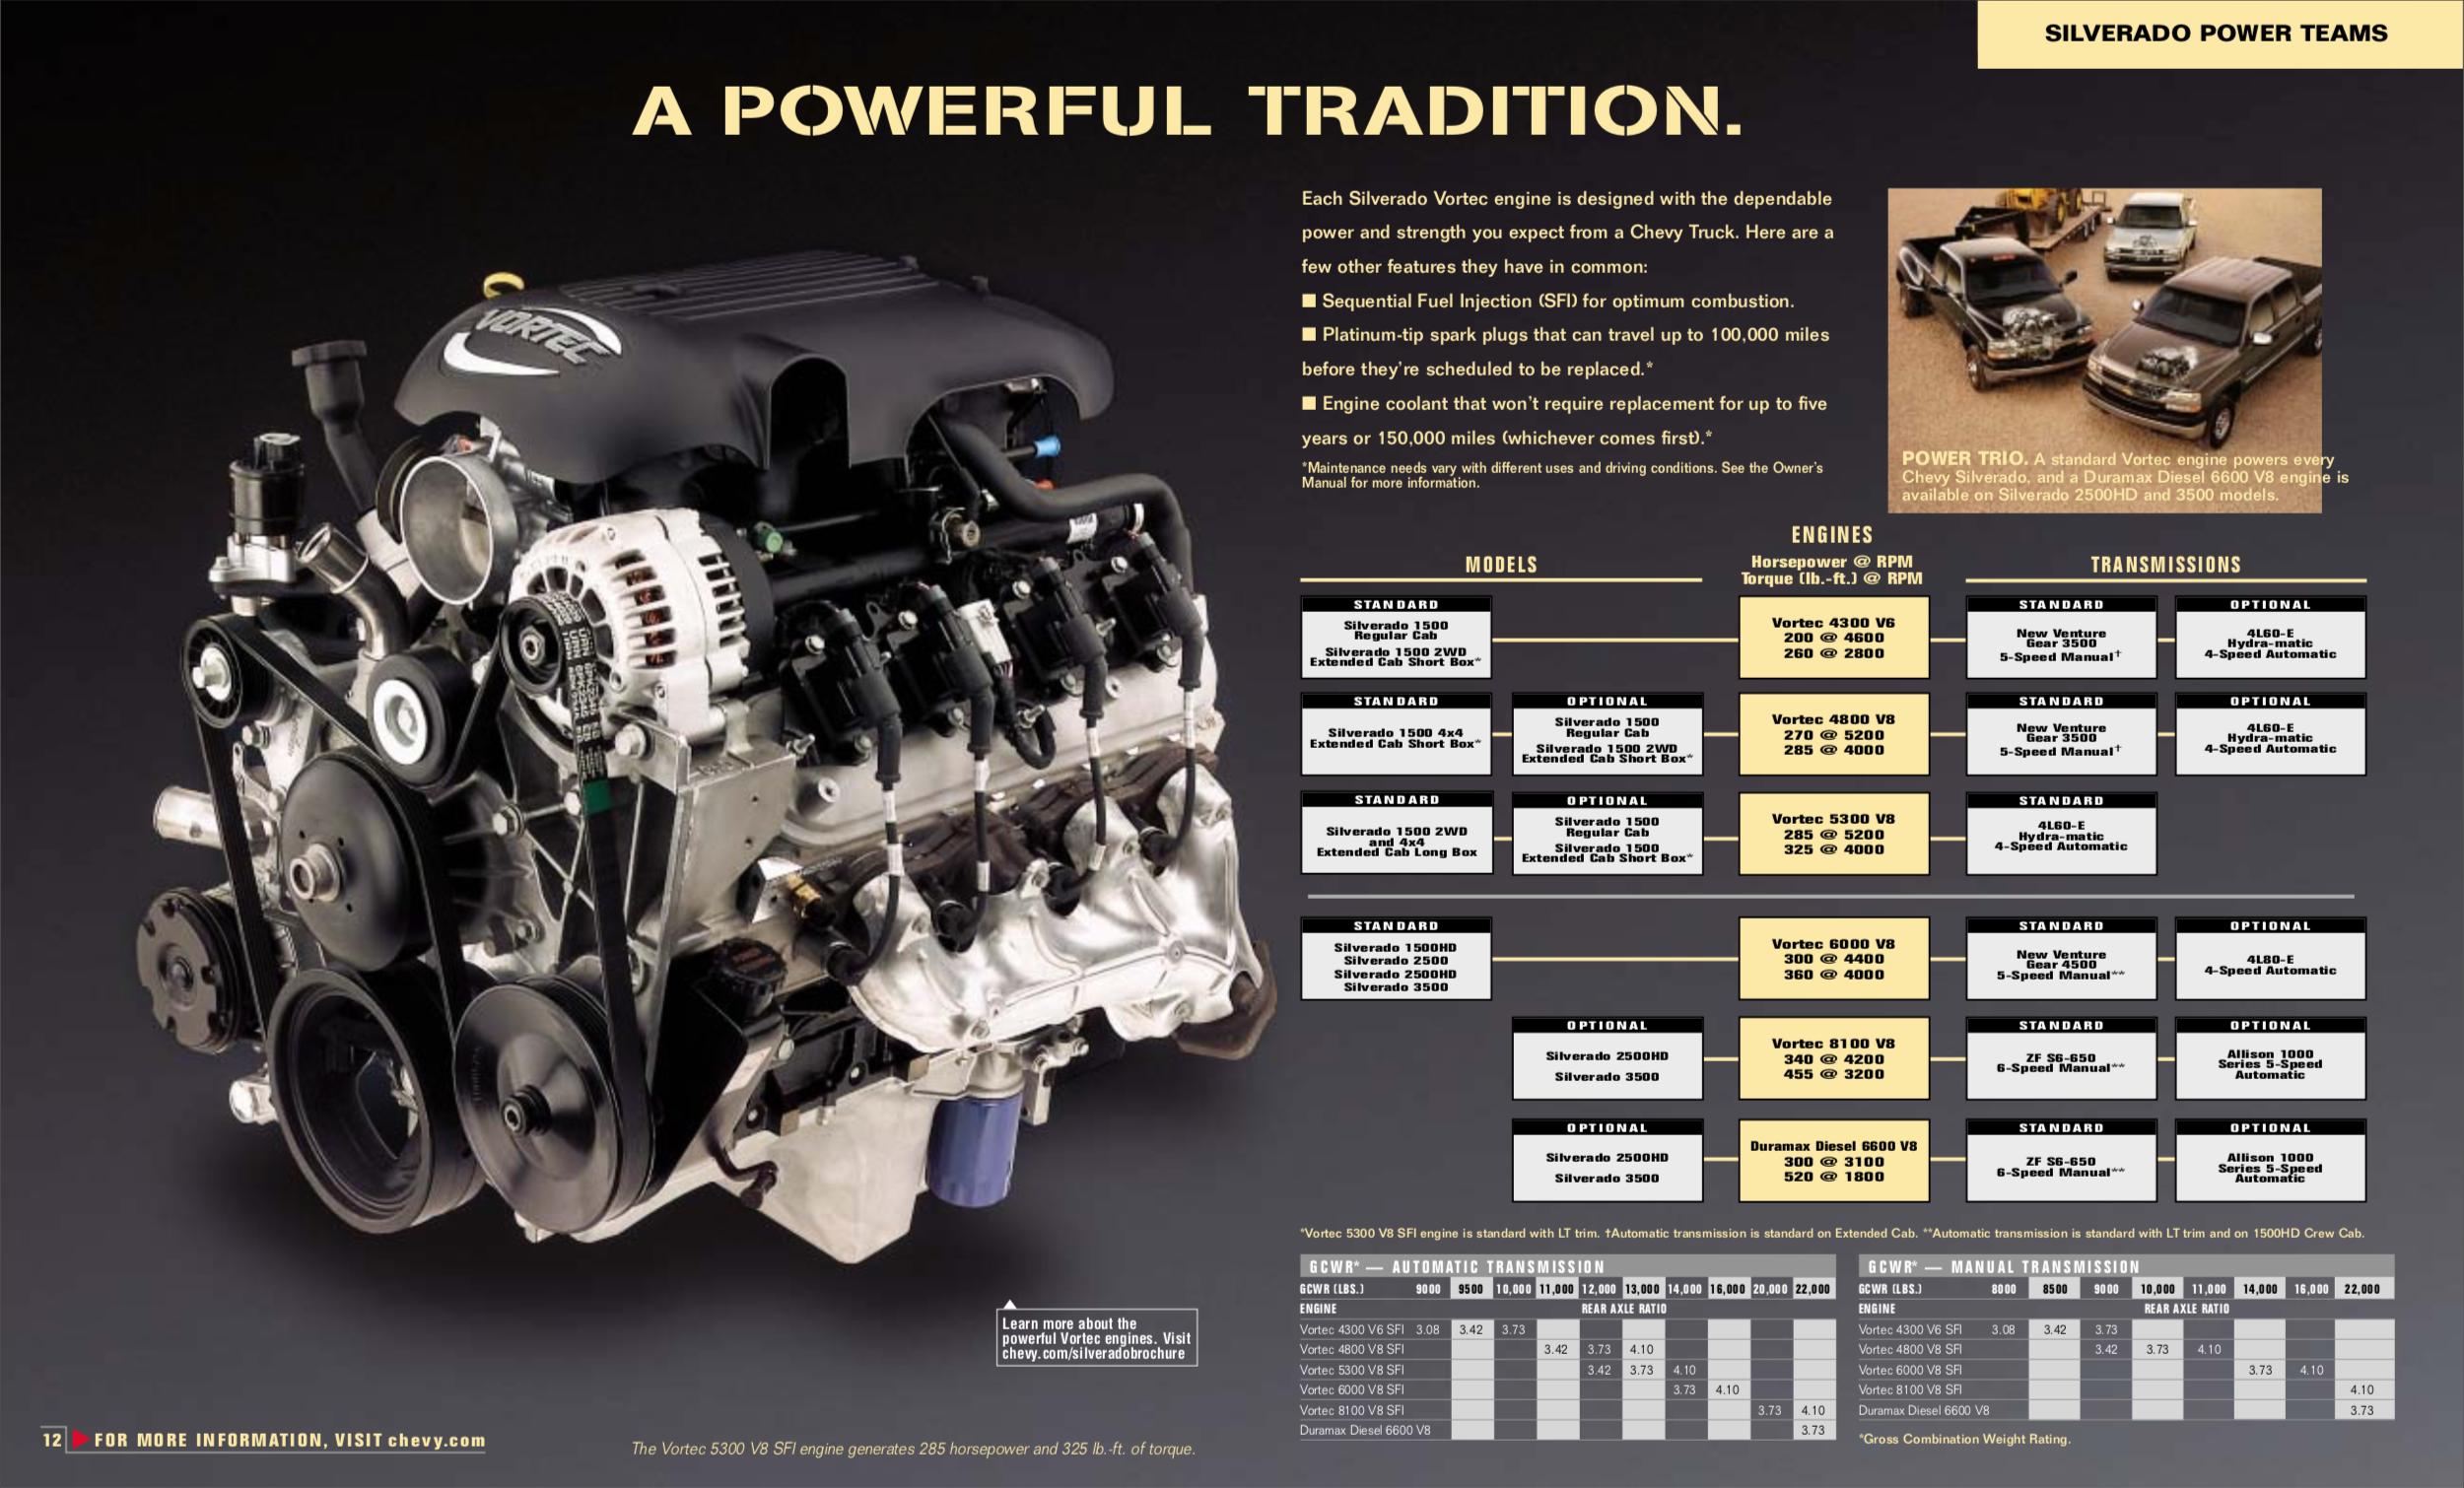 Vortec Engine/Transmission Options from 2002 Silverado